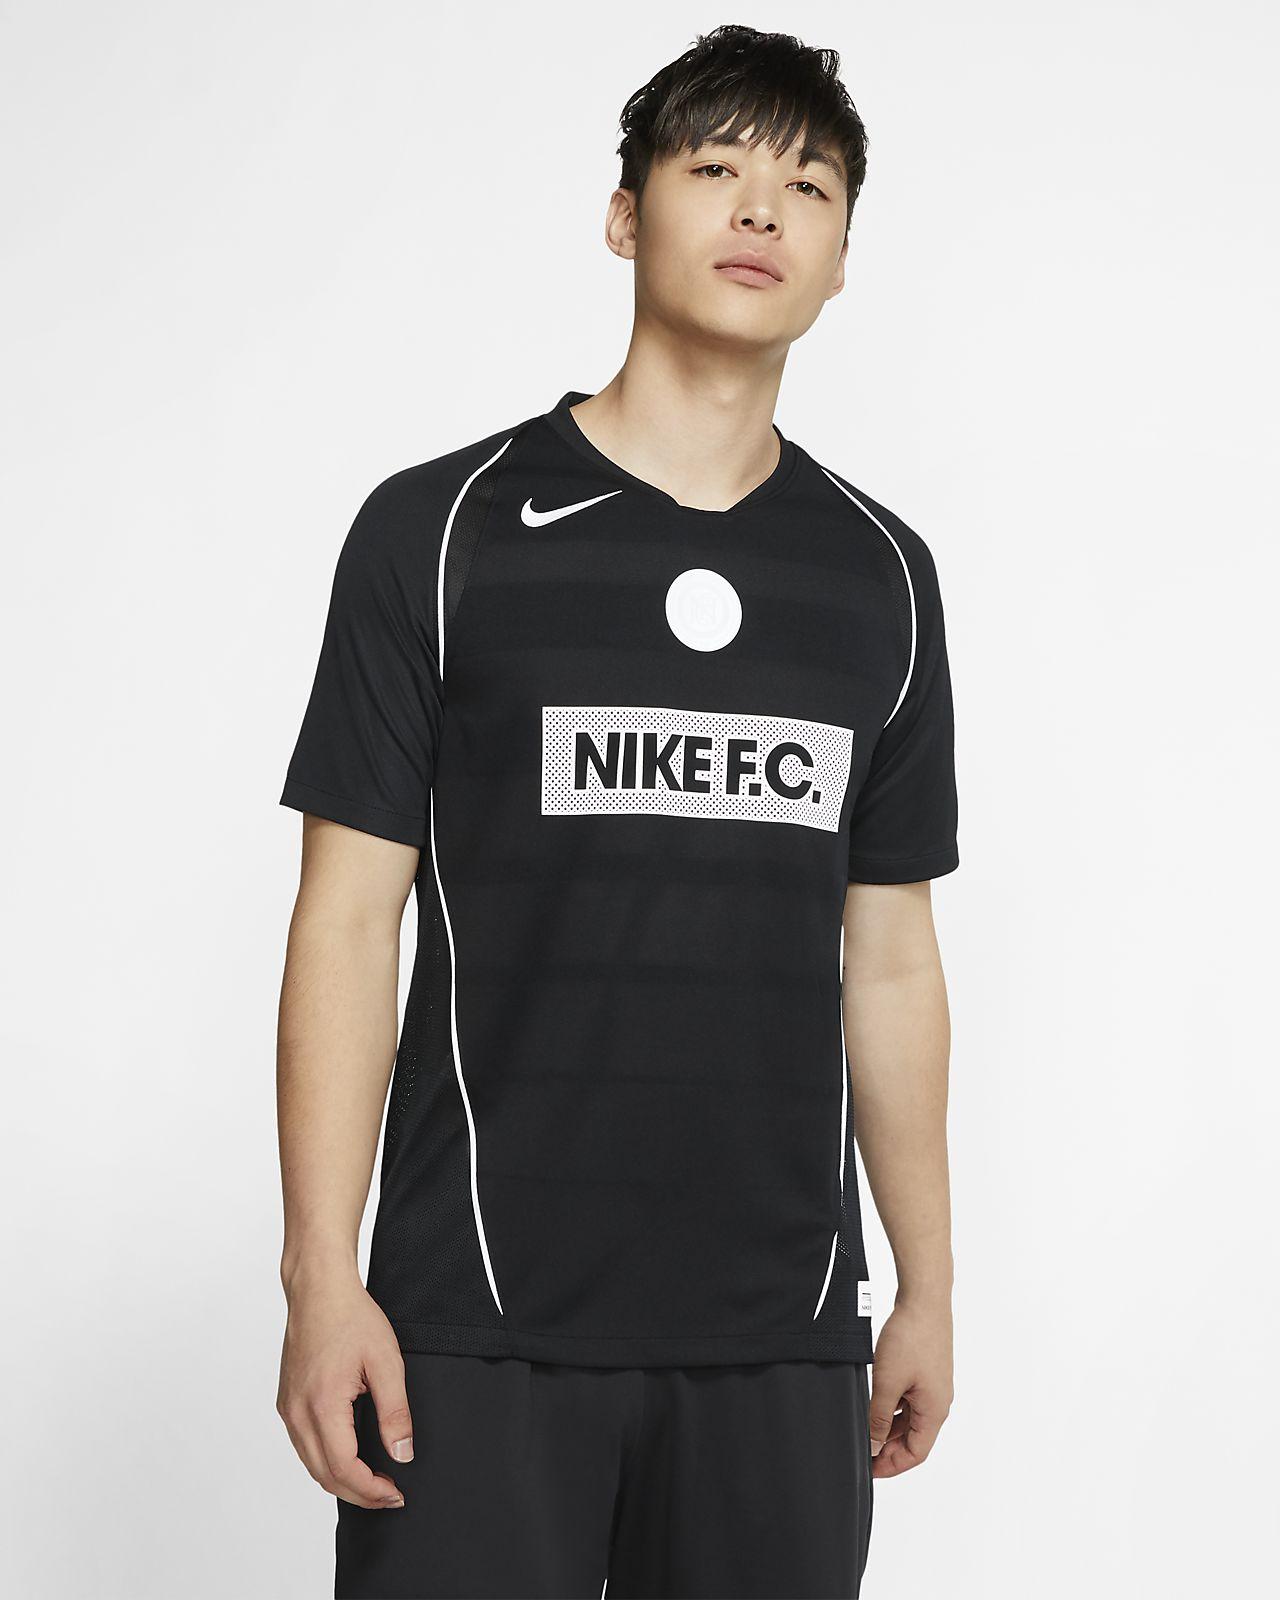 Męska koszulka piłkarska z krótkim rękawem Nike F.C. Home